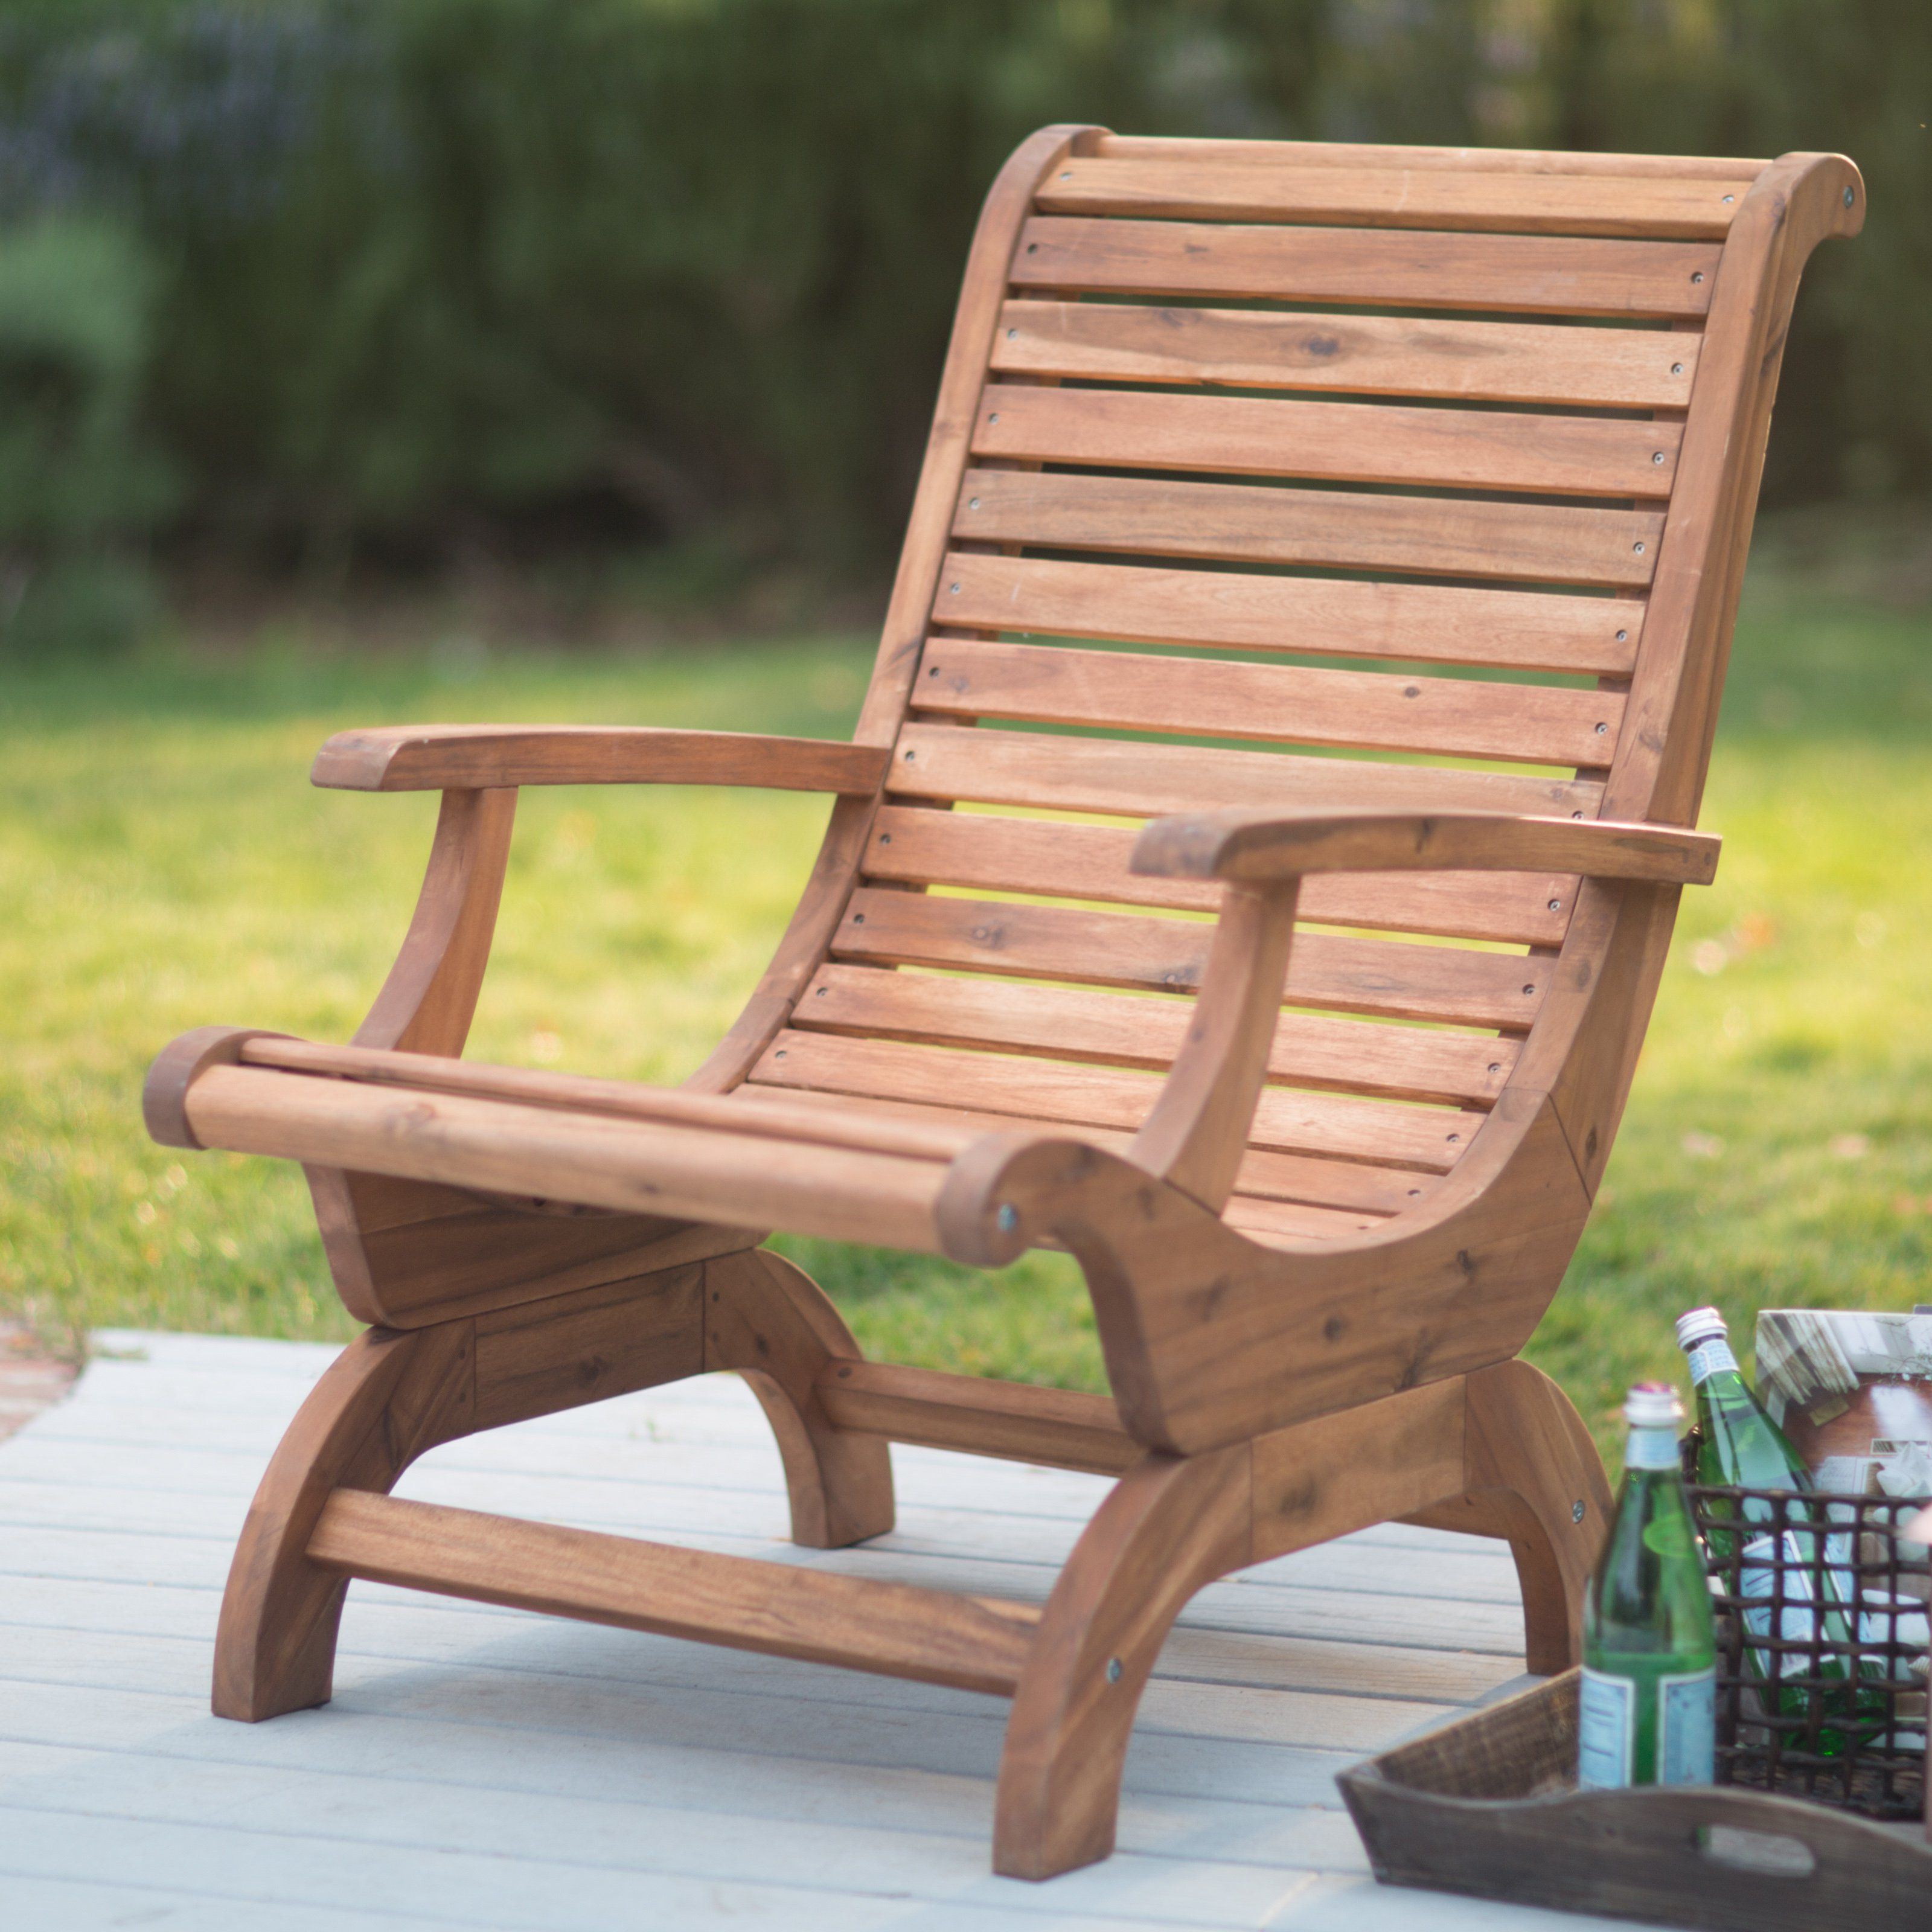 Outdoor Belham Living Avondale Adirondack Chair - Natural ...